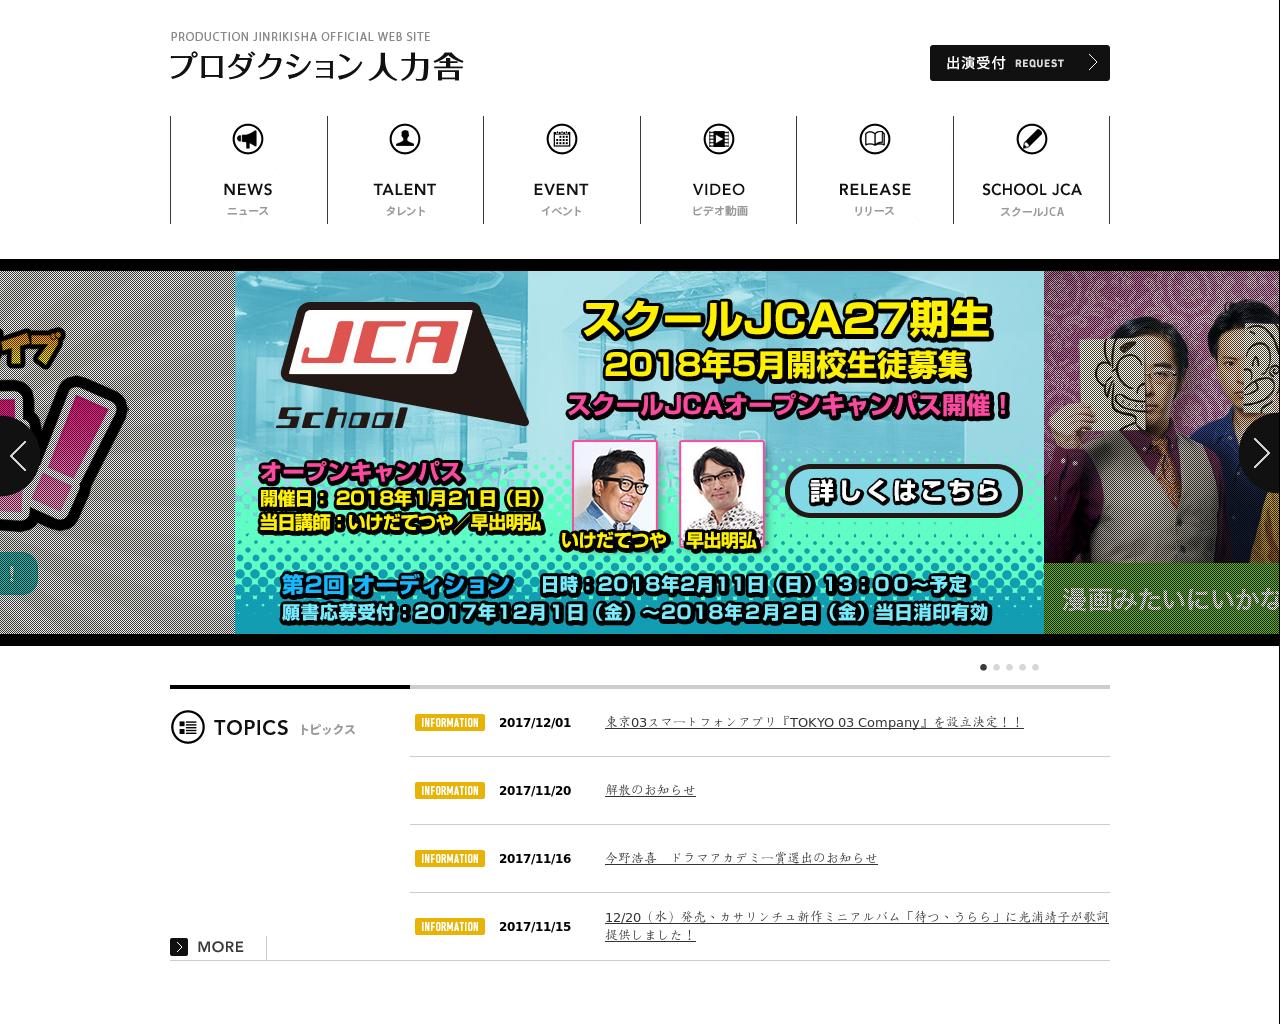 www.p-jinriki.com(2017/12/07 08:30:32)